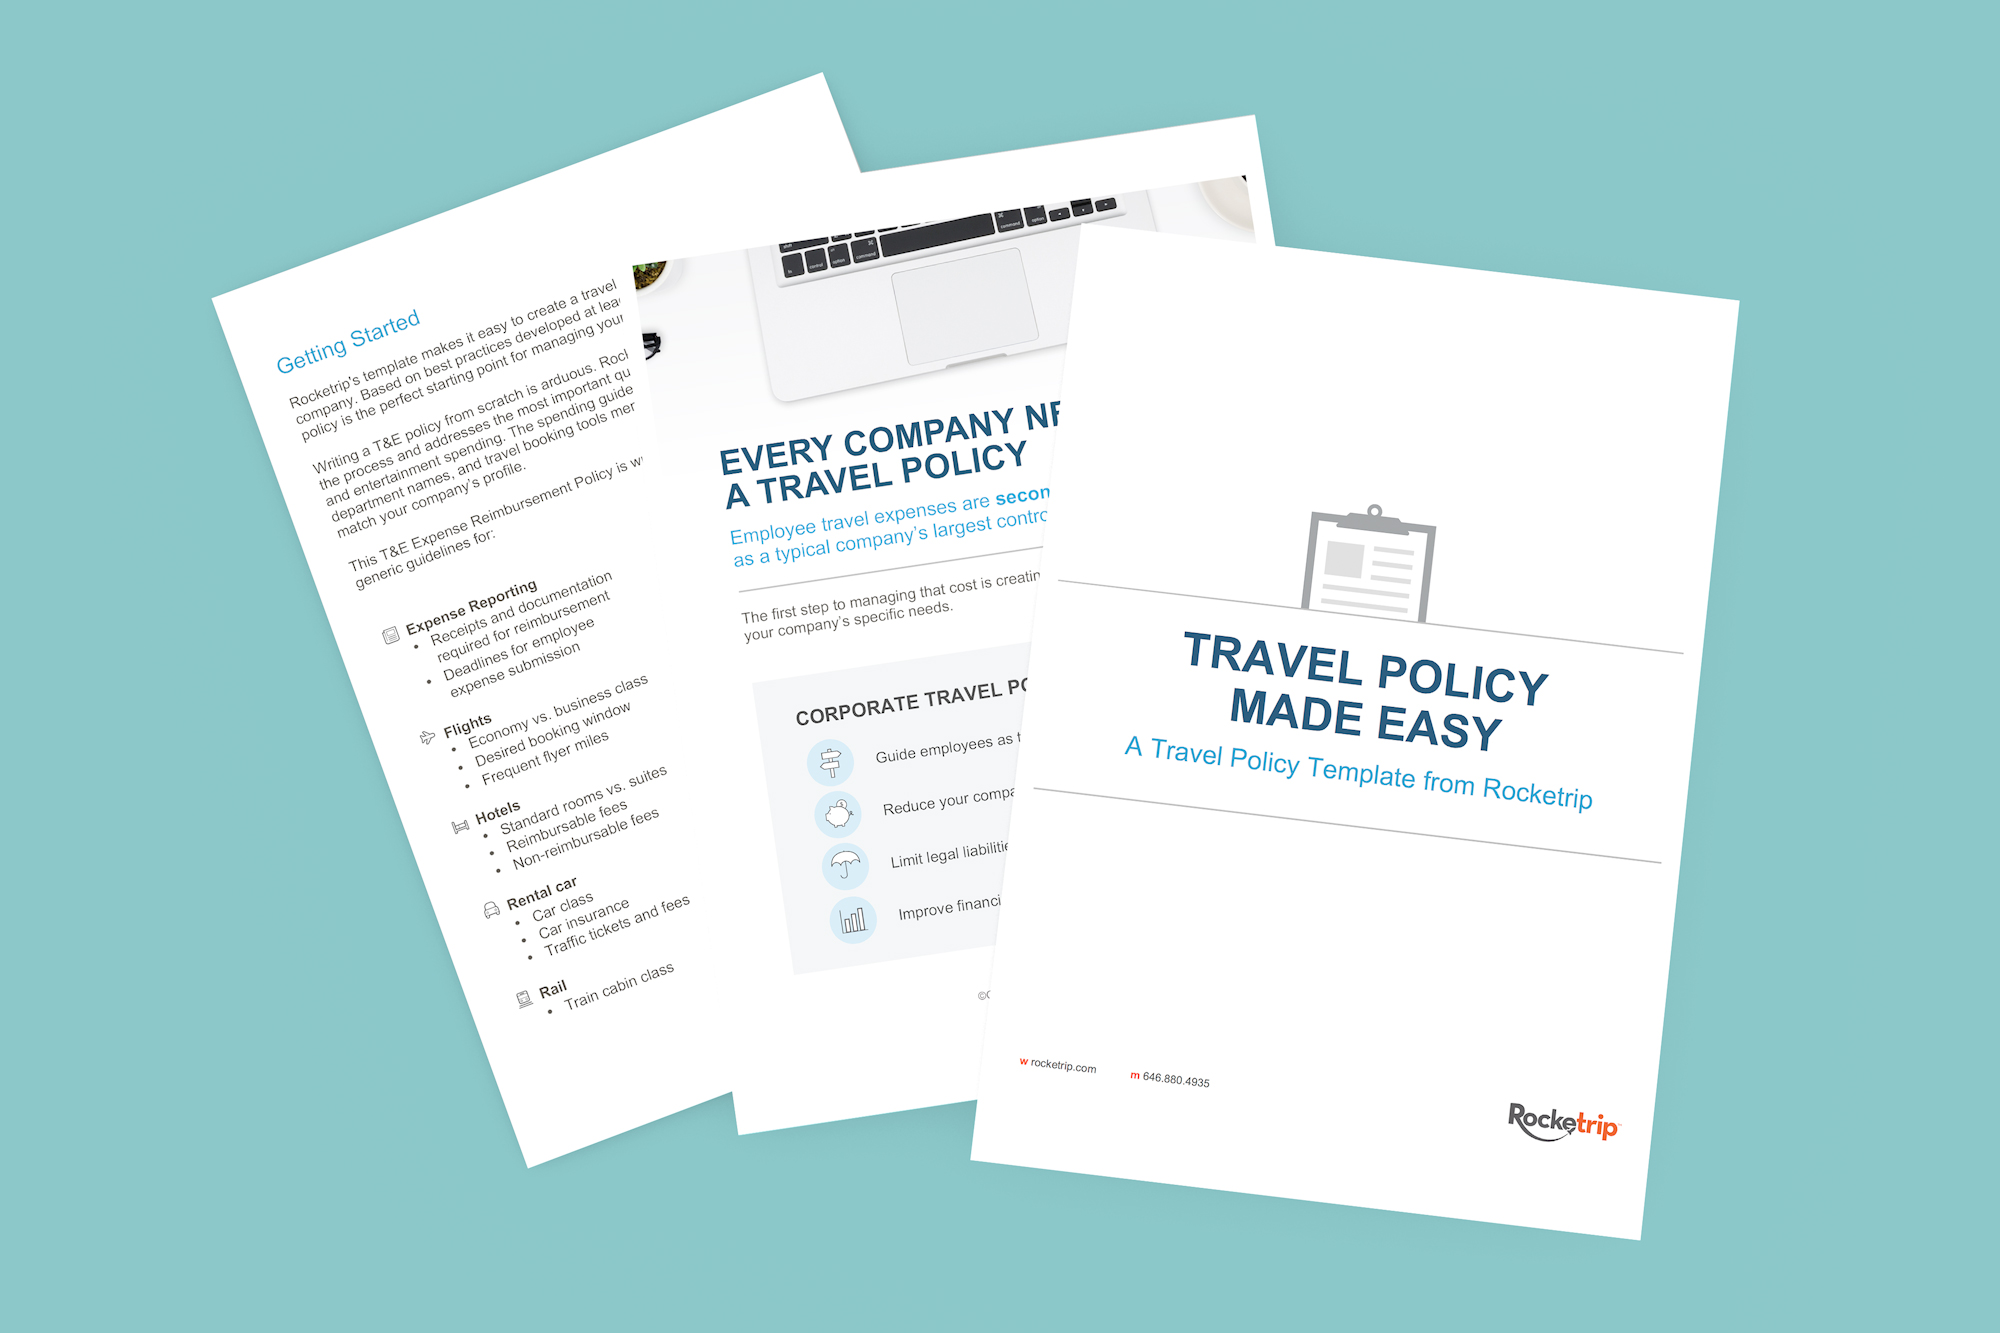 travel policy template rocketrip 2016 katari sporrong. Black Bedroom Furniture Sets. Home Design Ideas